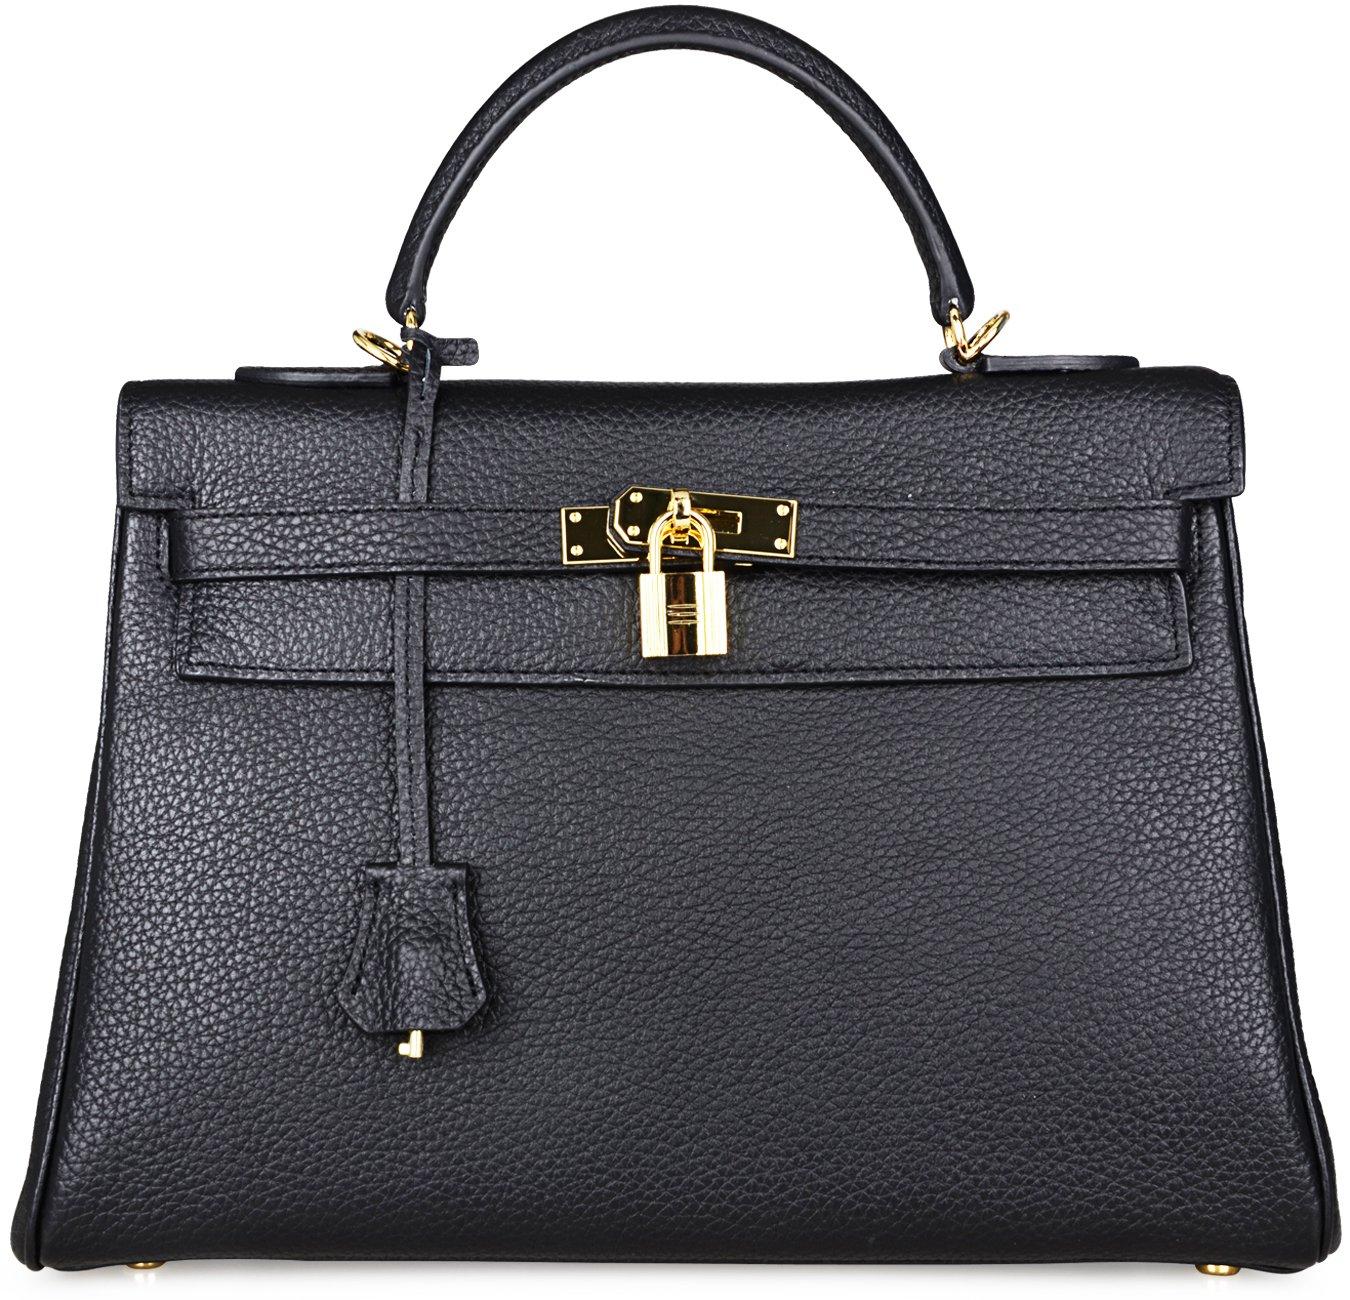 Cherish Kiss Women's Genuine Leather Tote Bag Cross Body Shoulder Padlock Handbags K32 (32CM, Black)